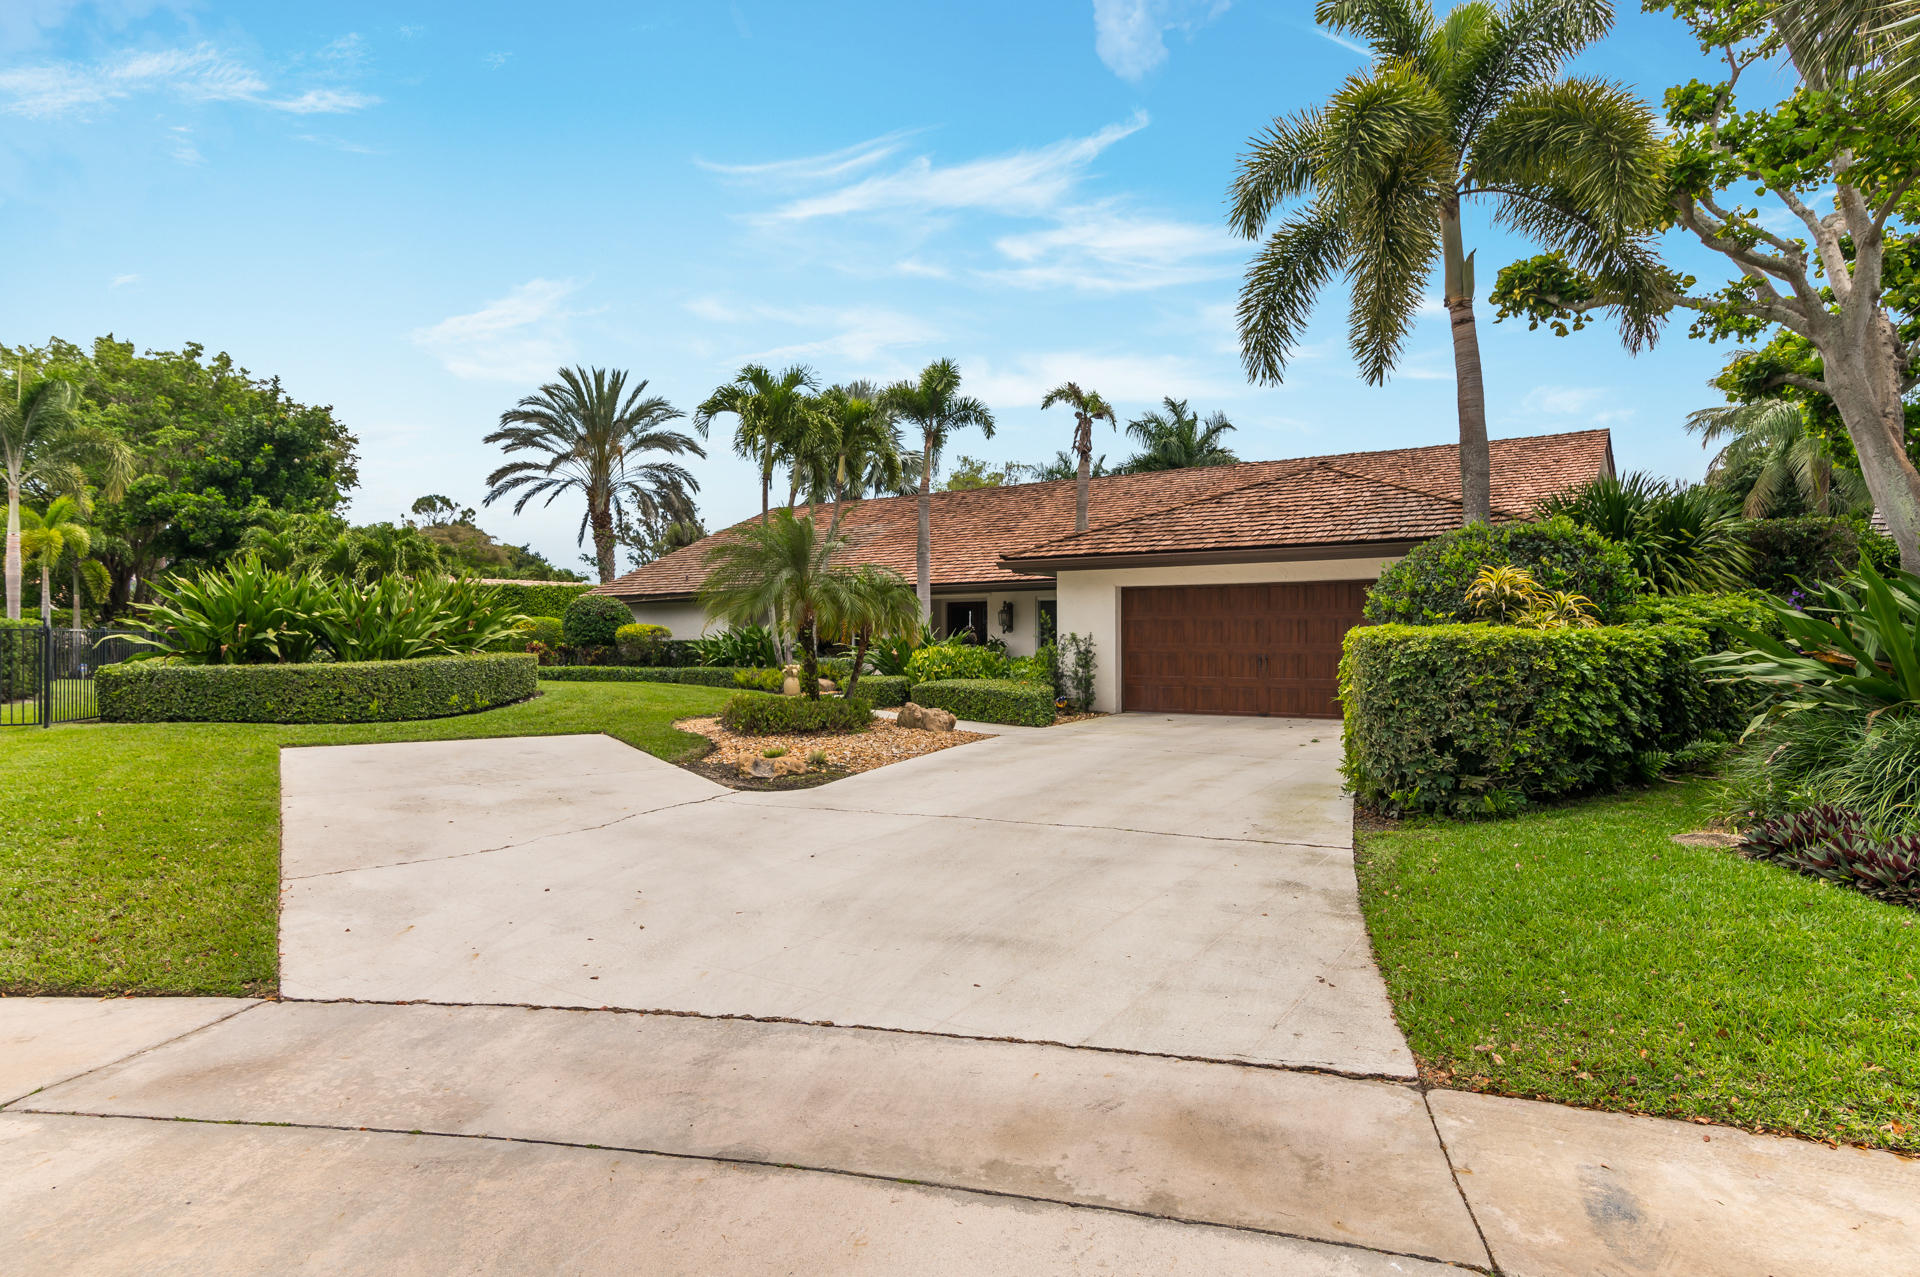 20960 Blanca Terrace  Boca Raton FL 33433